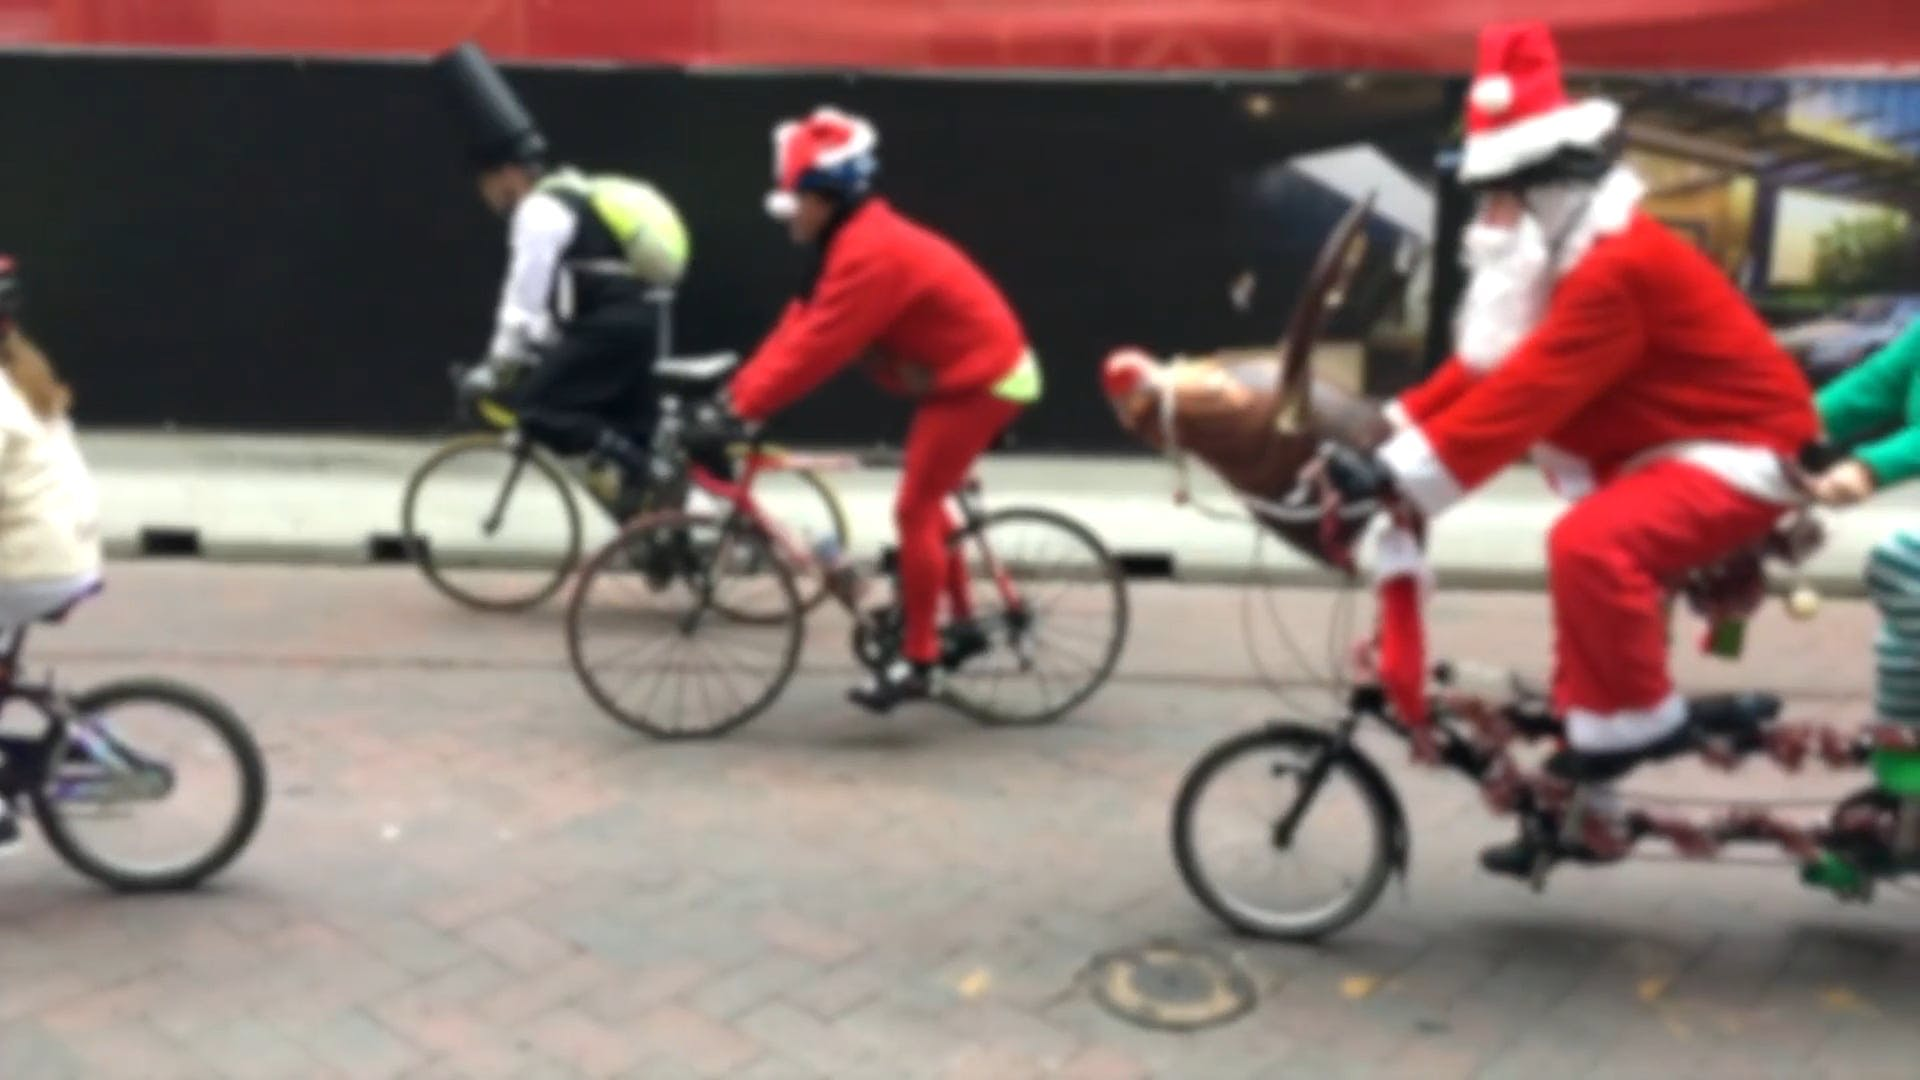 People Wearing Santa Claus Costume